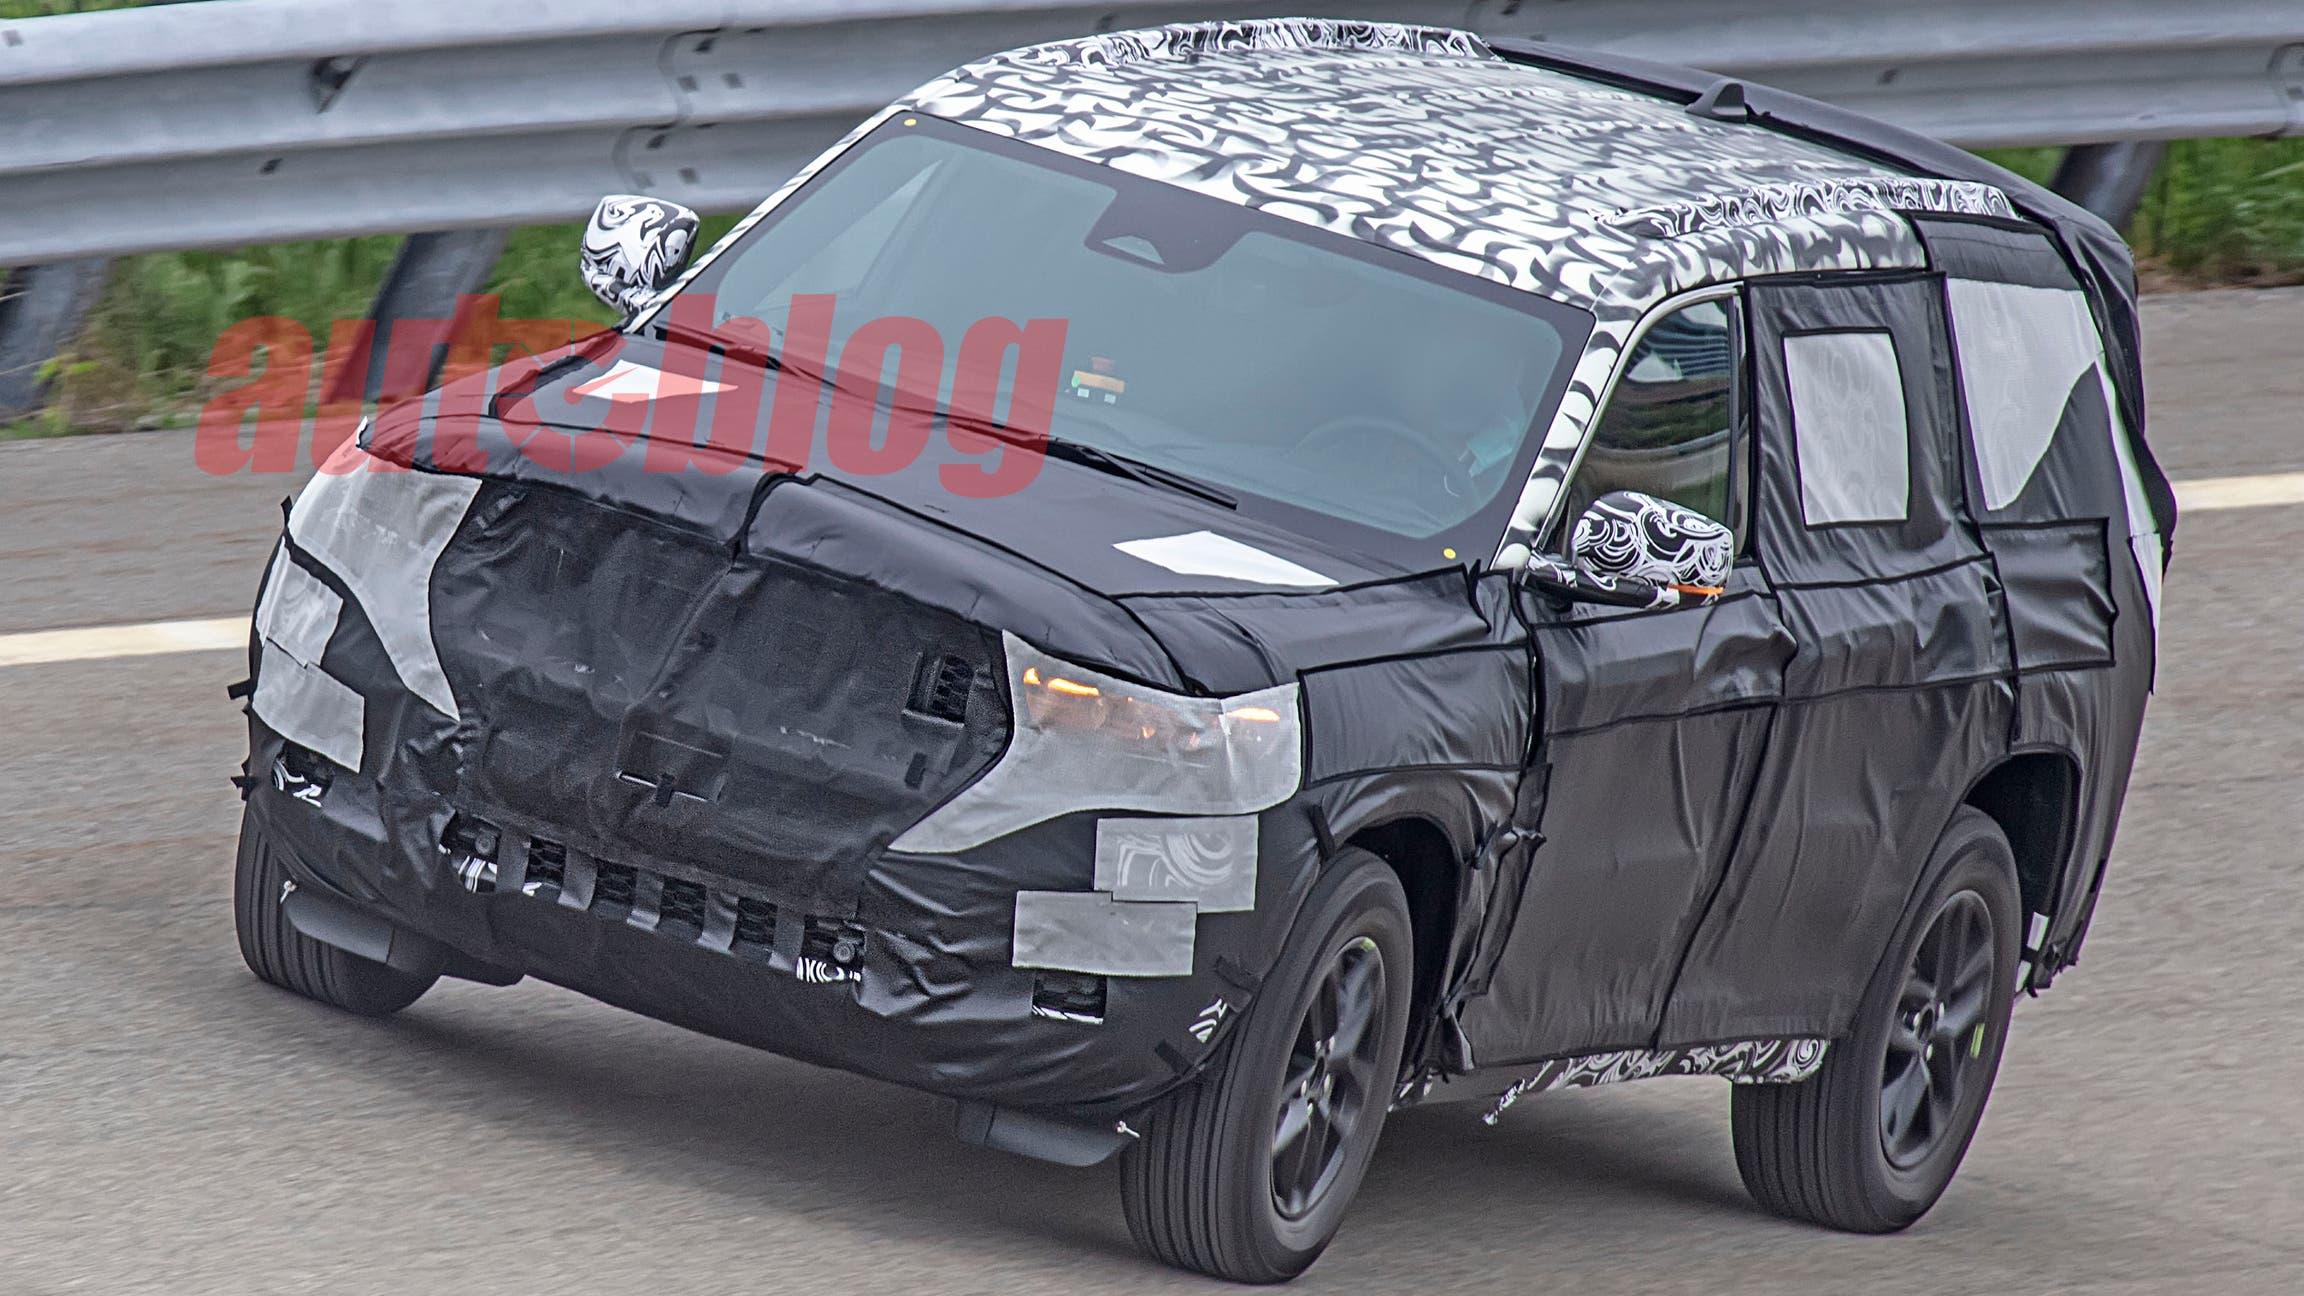 Nuova Jeep Grand Cherokee foto spia